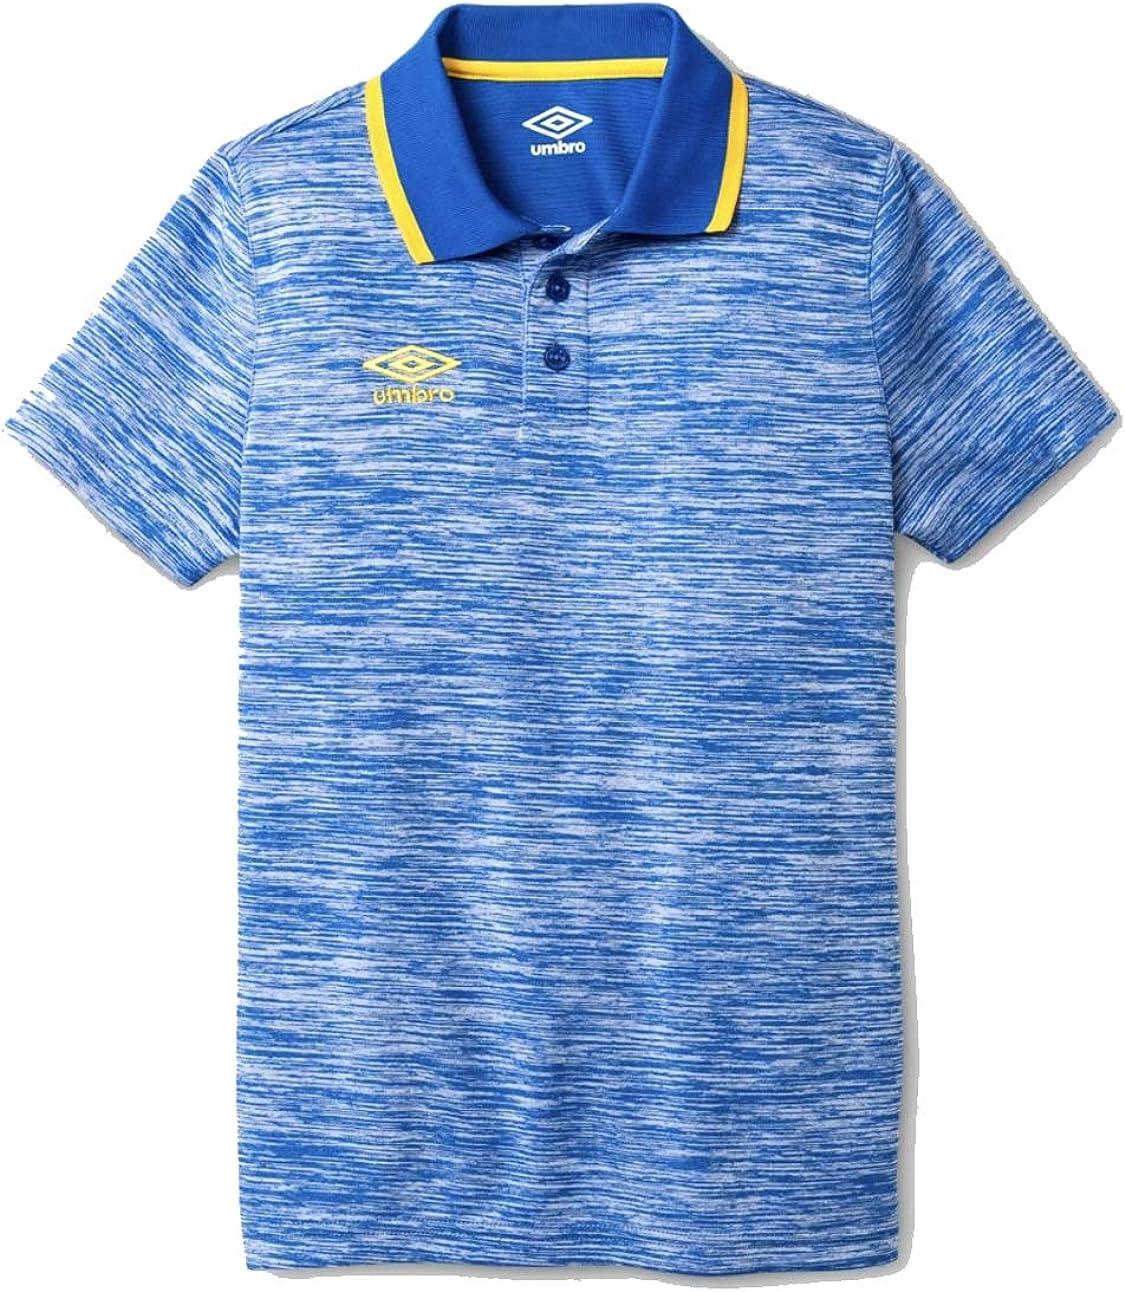 Umbro Boys' Heather Polo Shirt -